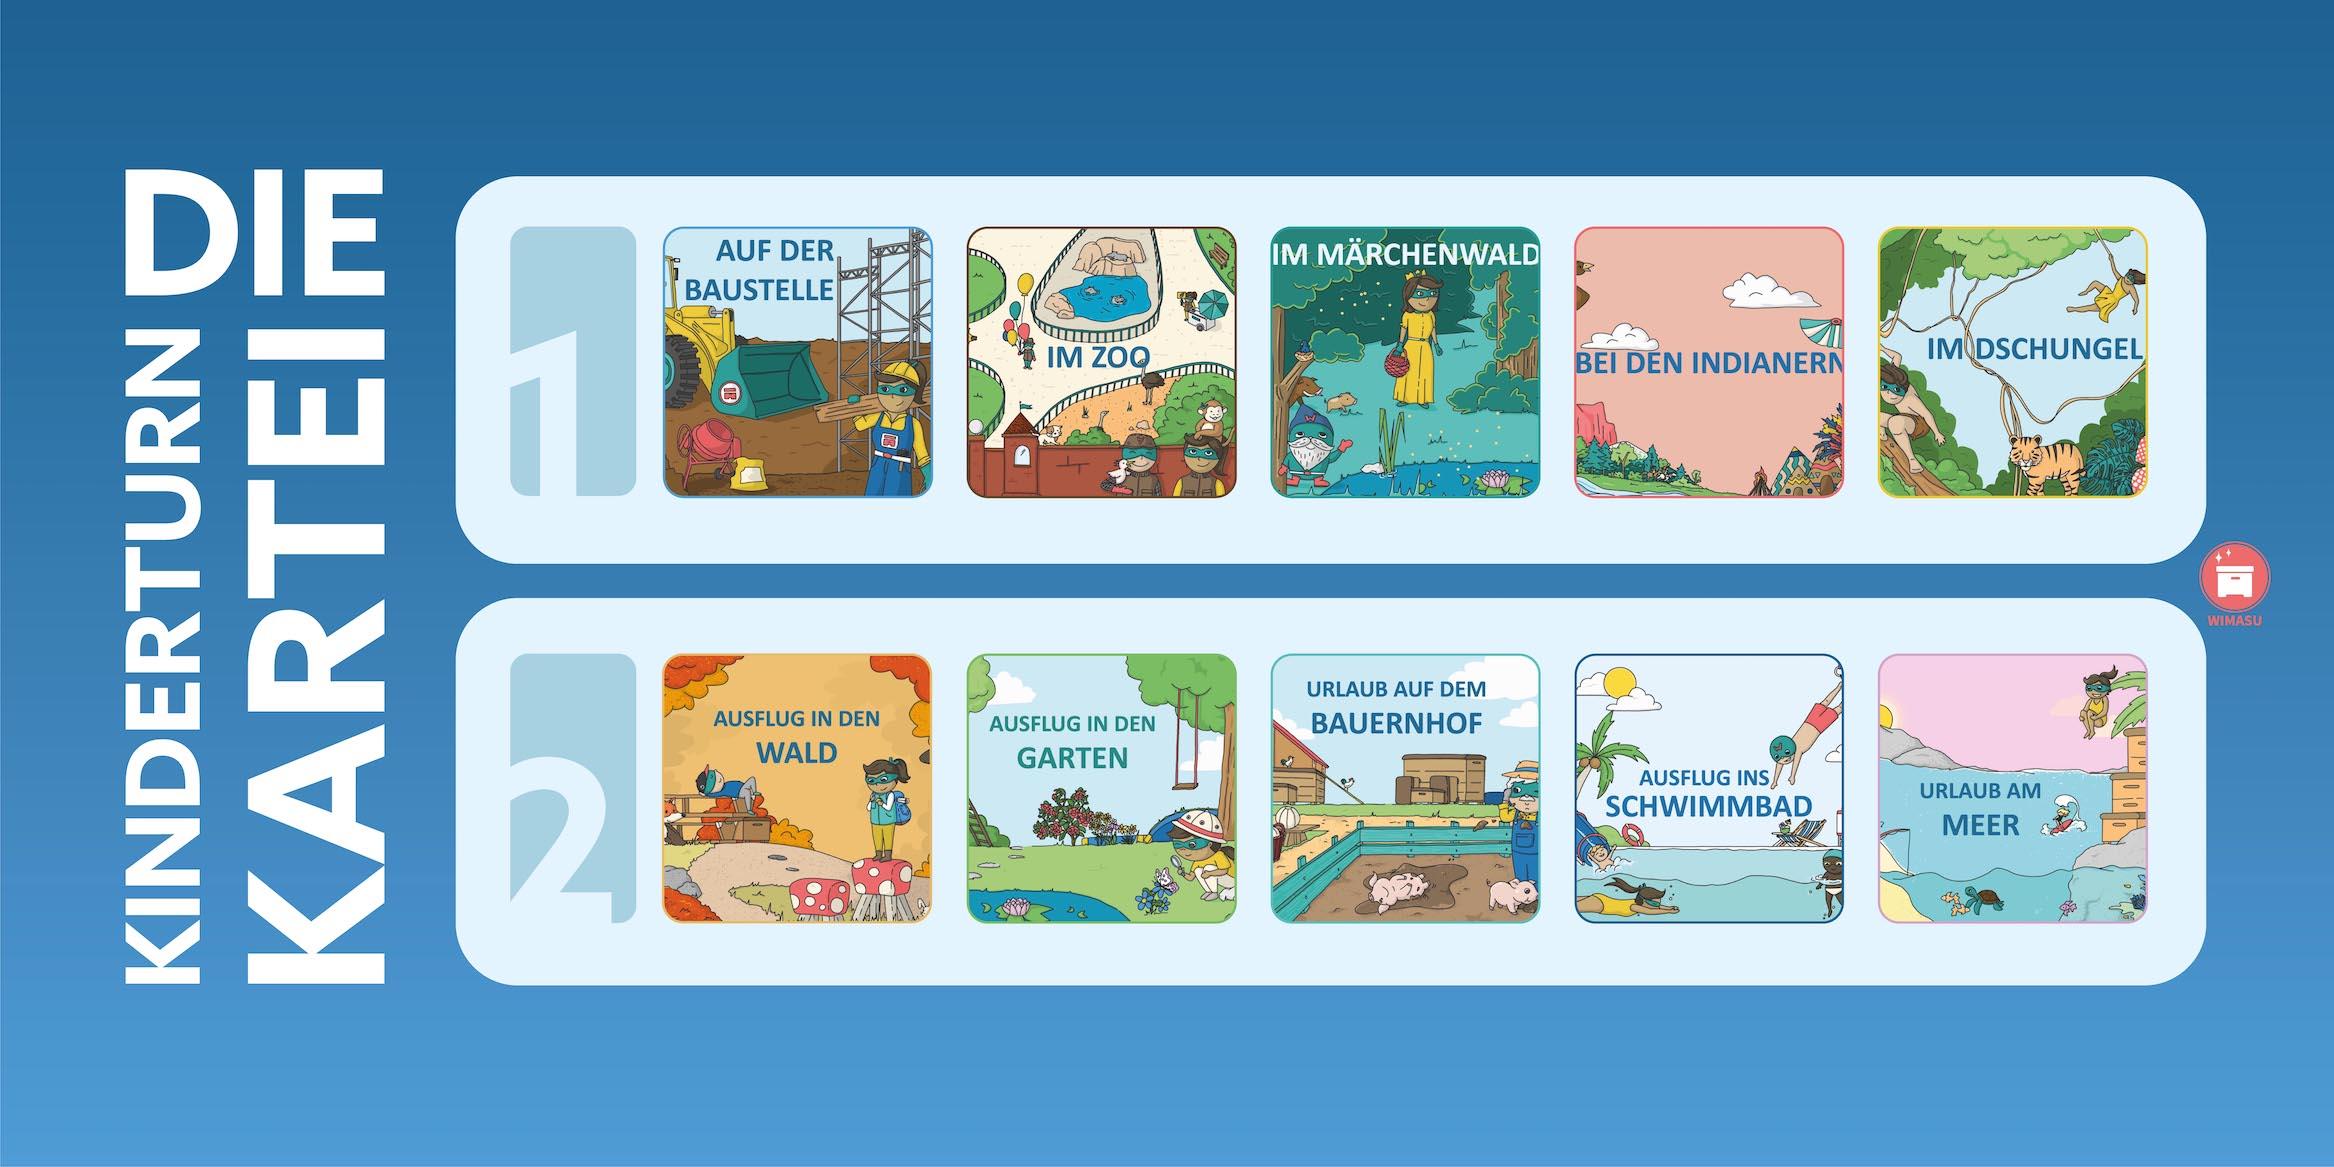 kinderturnen aufbau stationskarten wimasu grundschule11